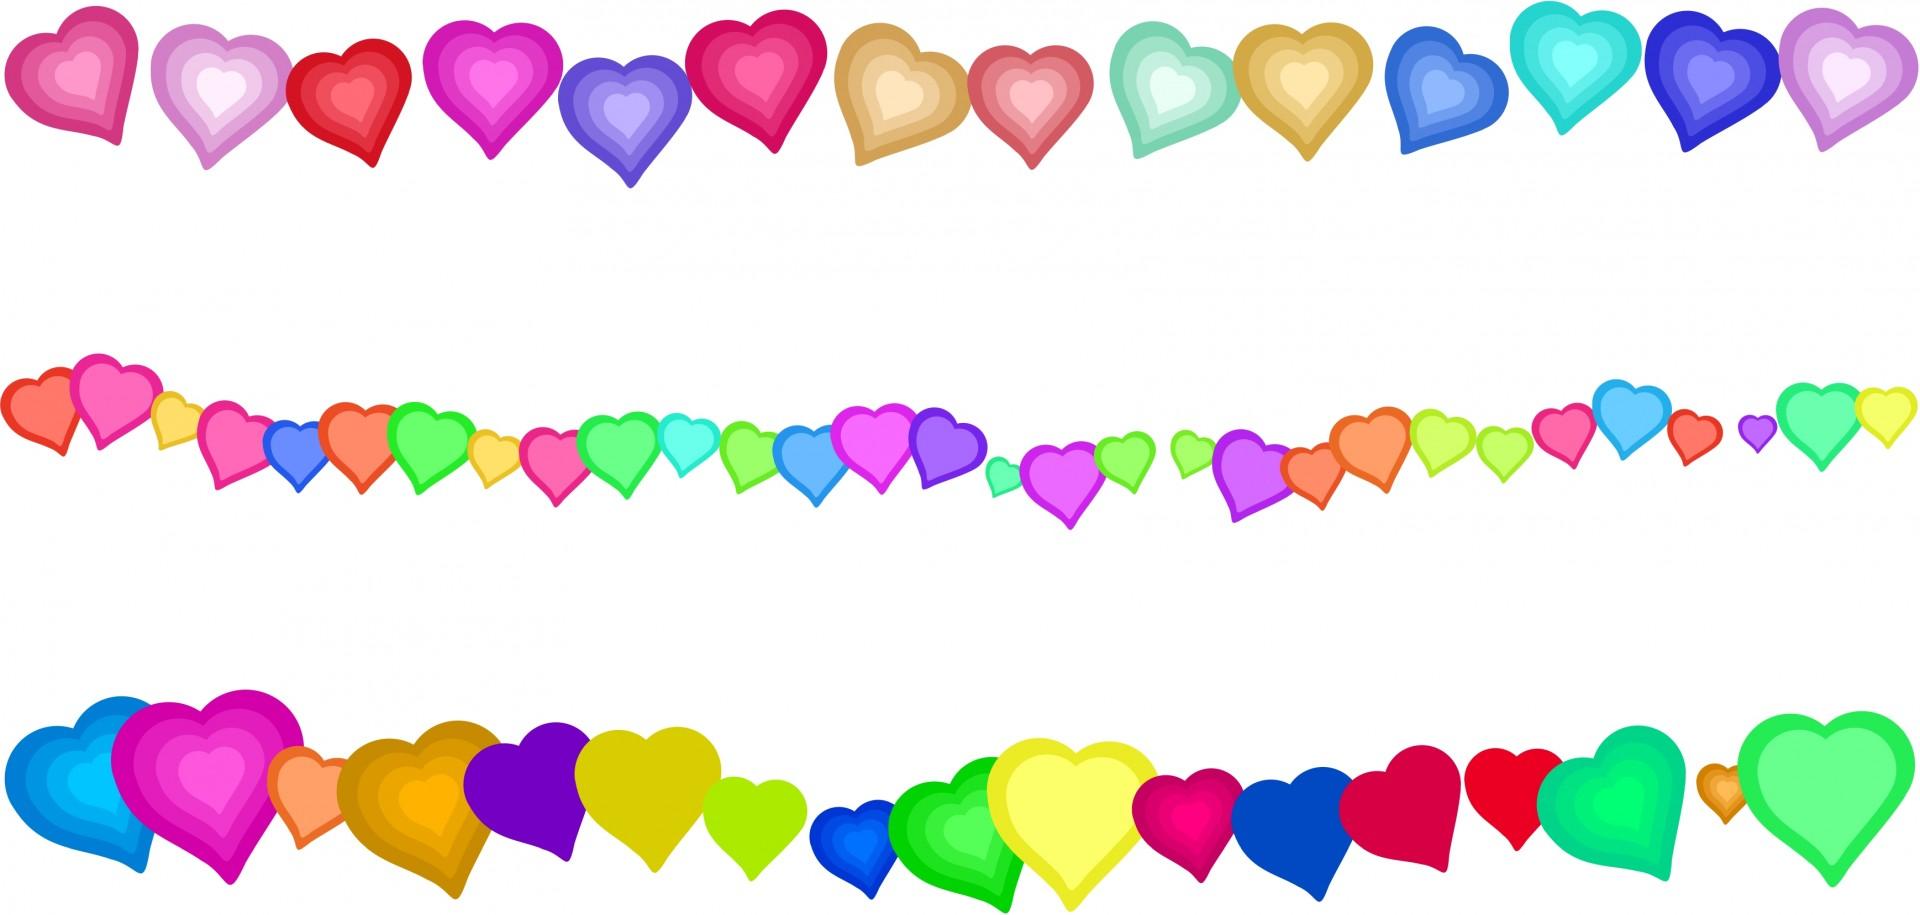 1920x915 Fascinating Heart Border Clip Art Edges Free Stock Photo Public